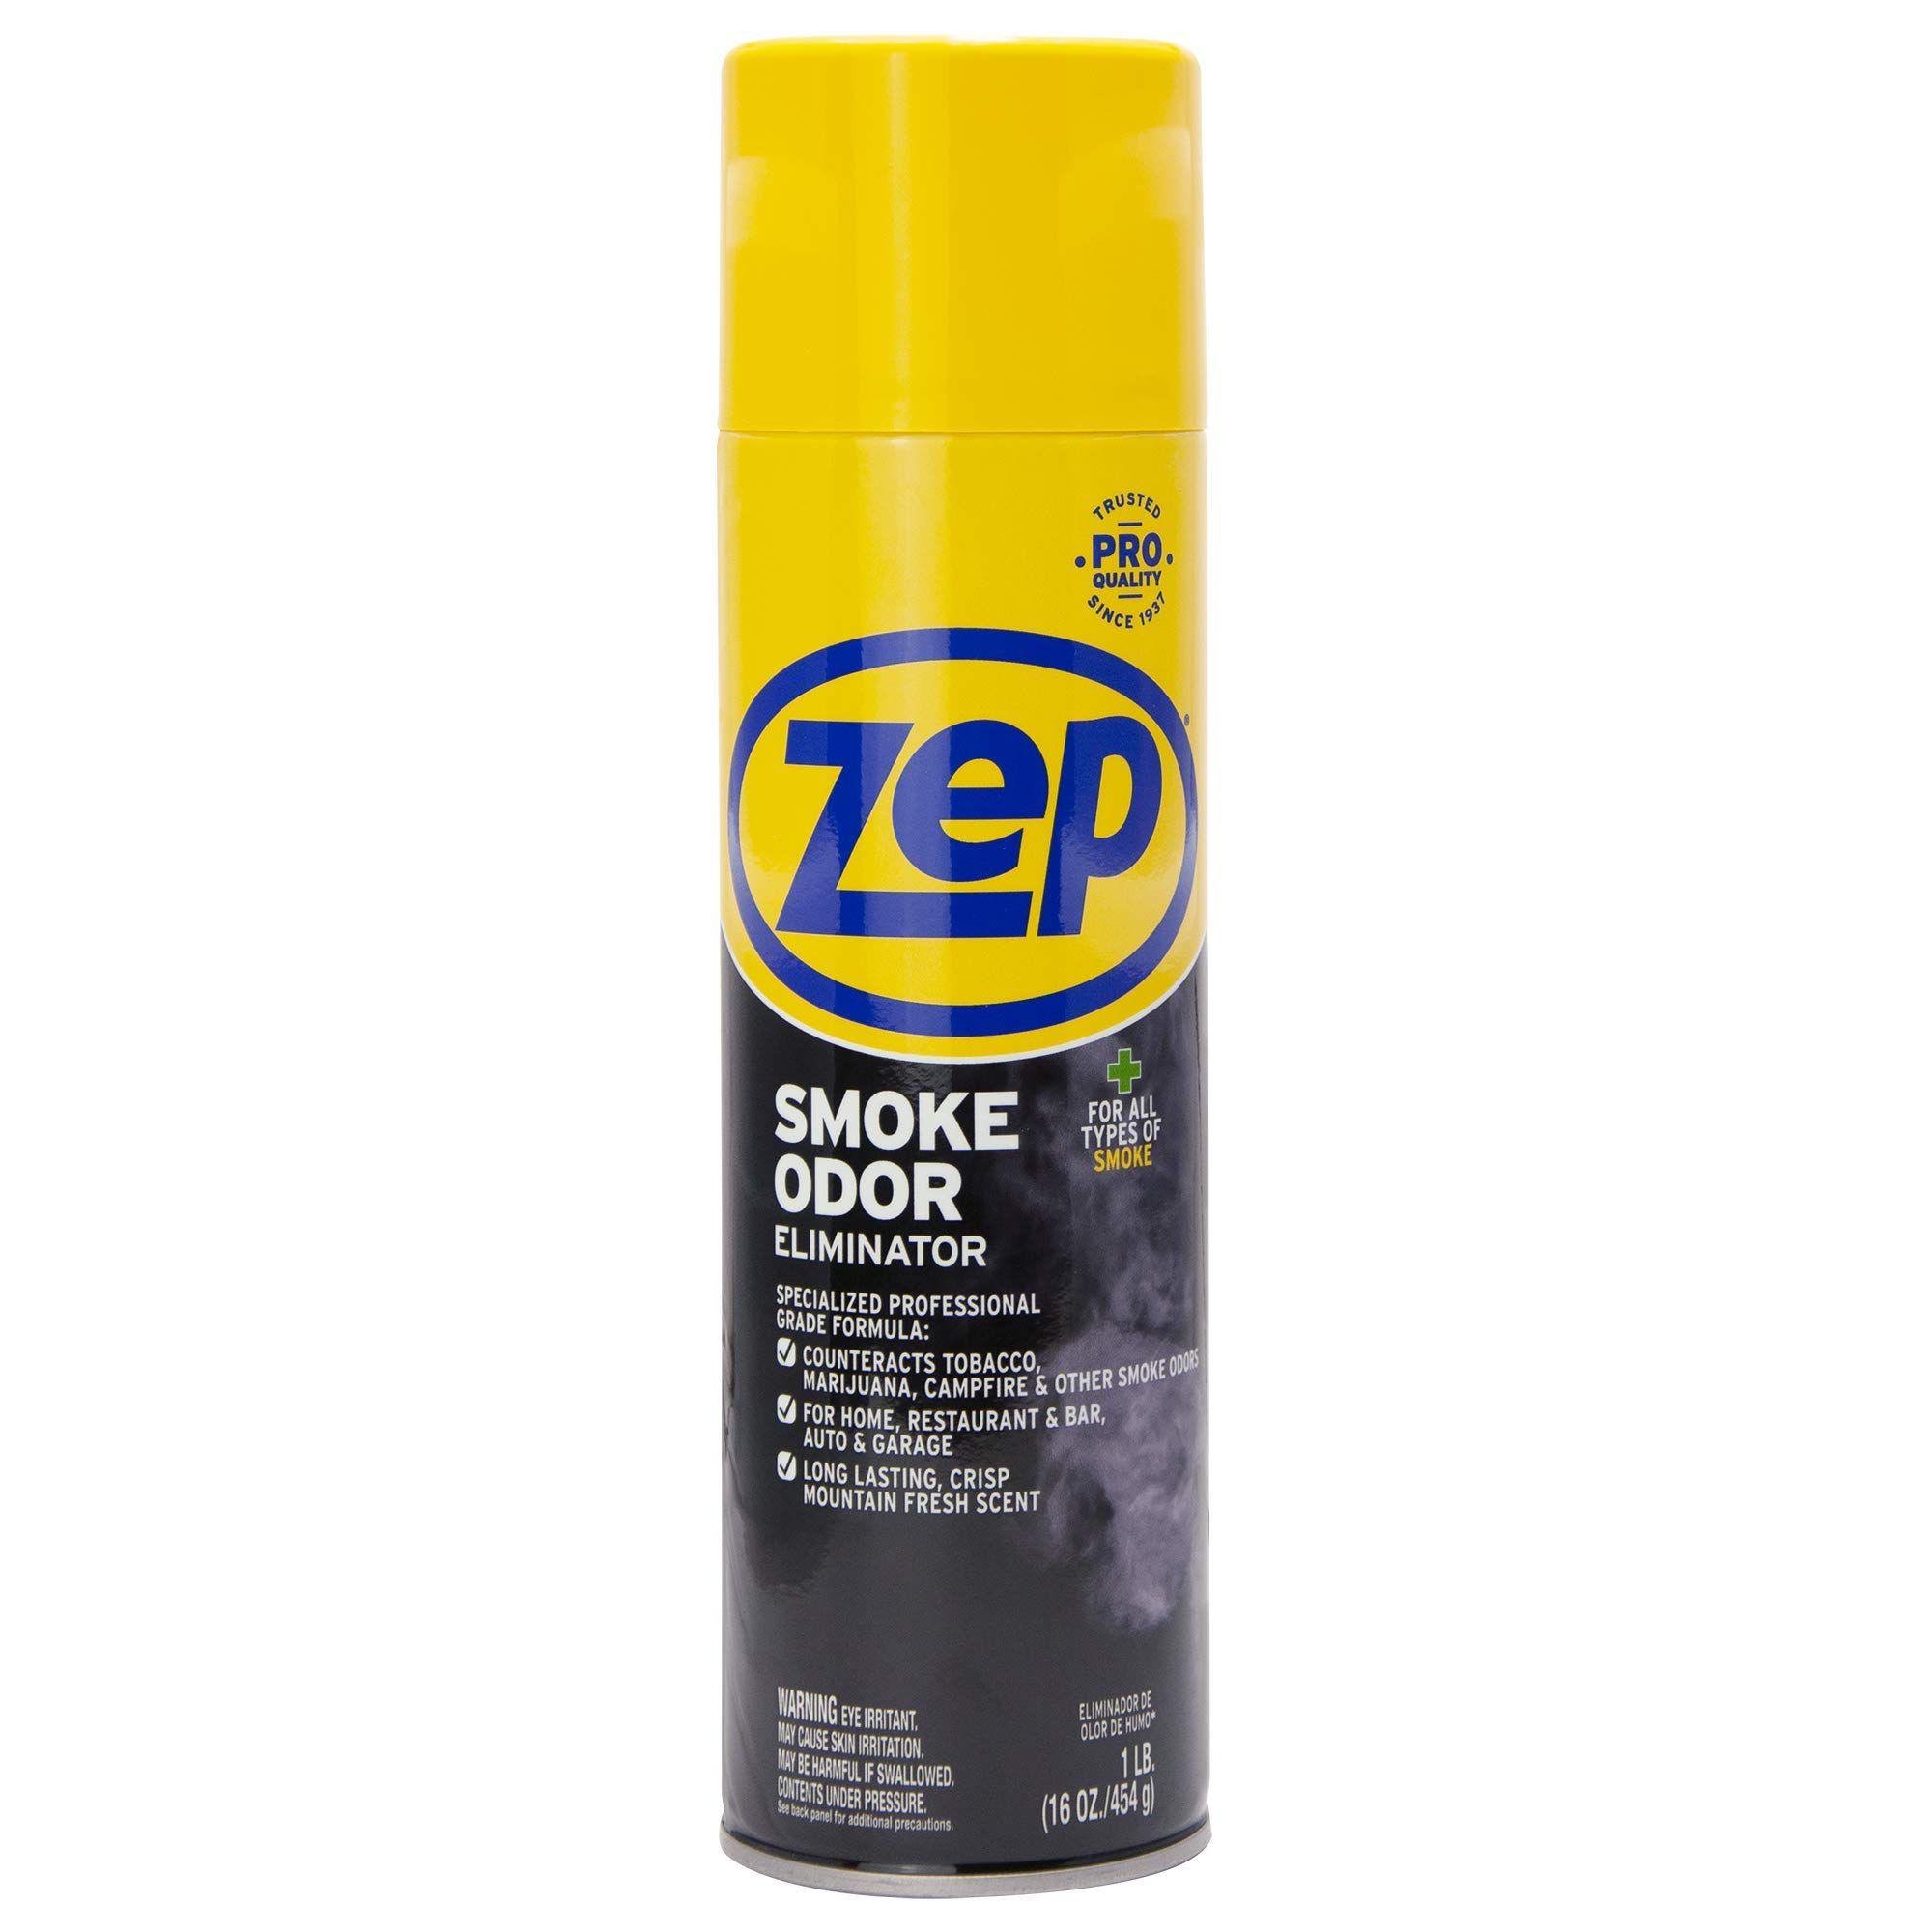 Zep Smoke Odor Eliminator